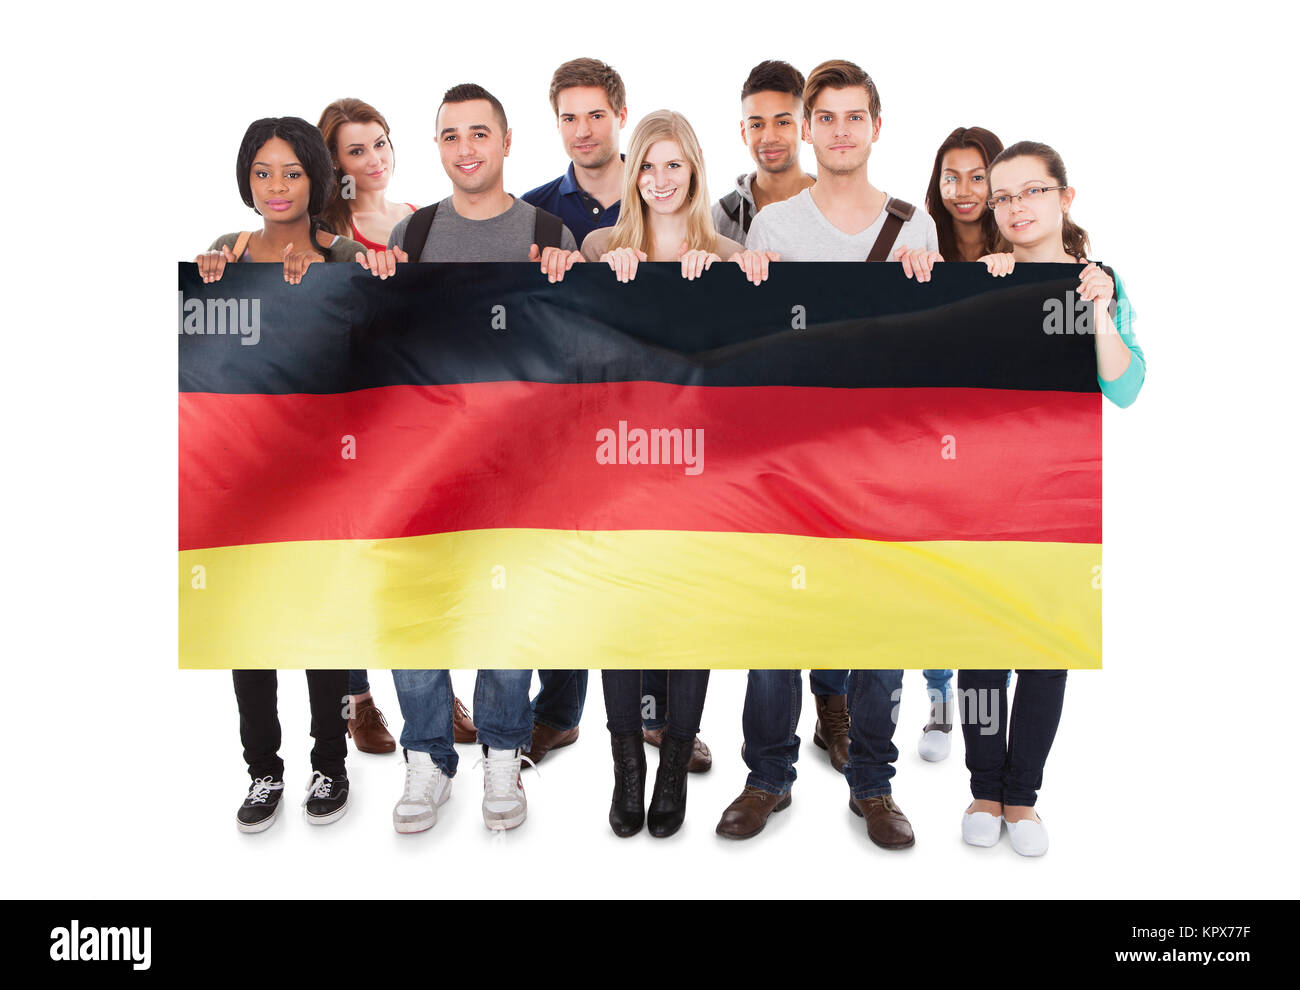 Les étudiants du Collège Affichage Blank Billboard Photo Stock